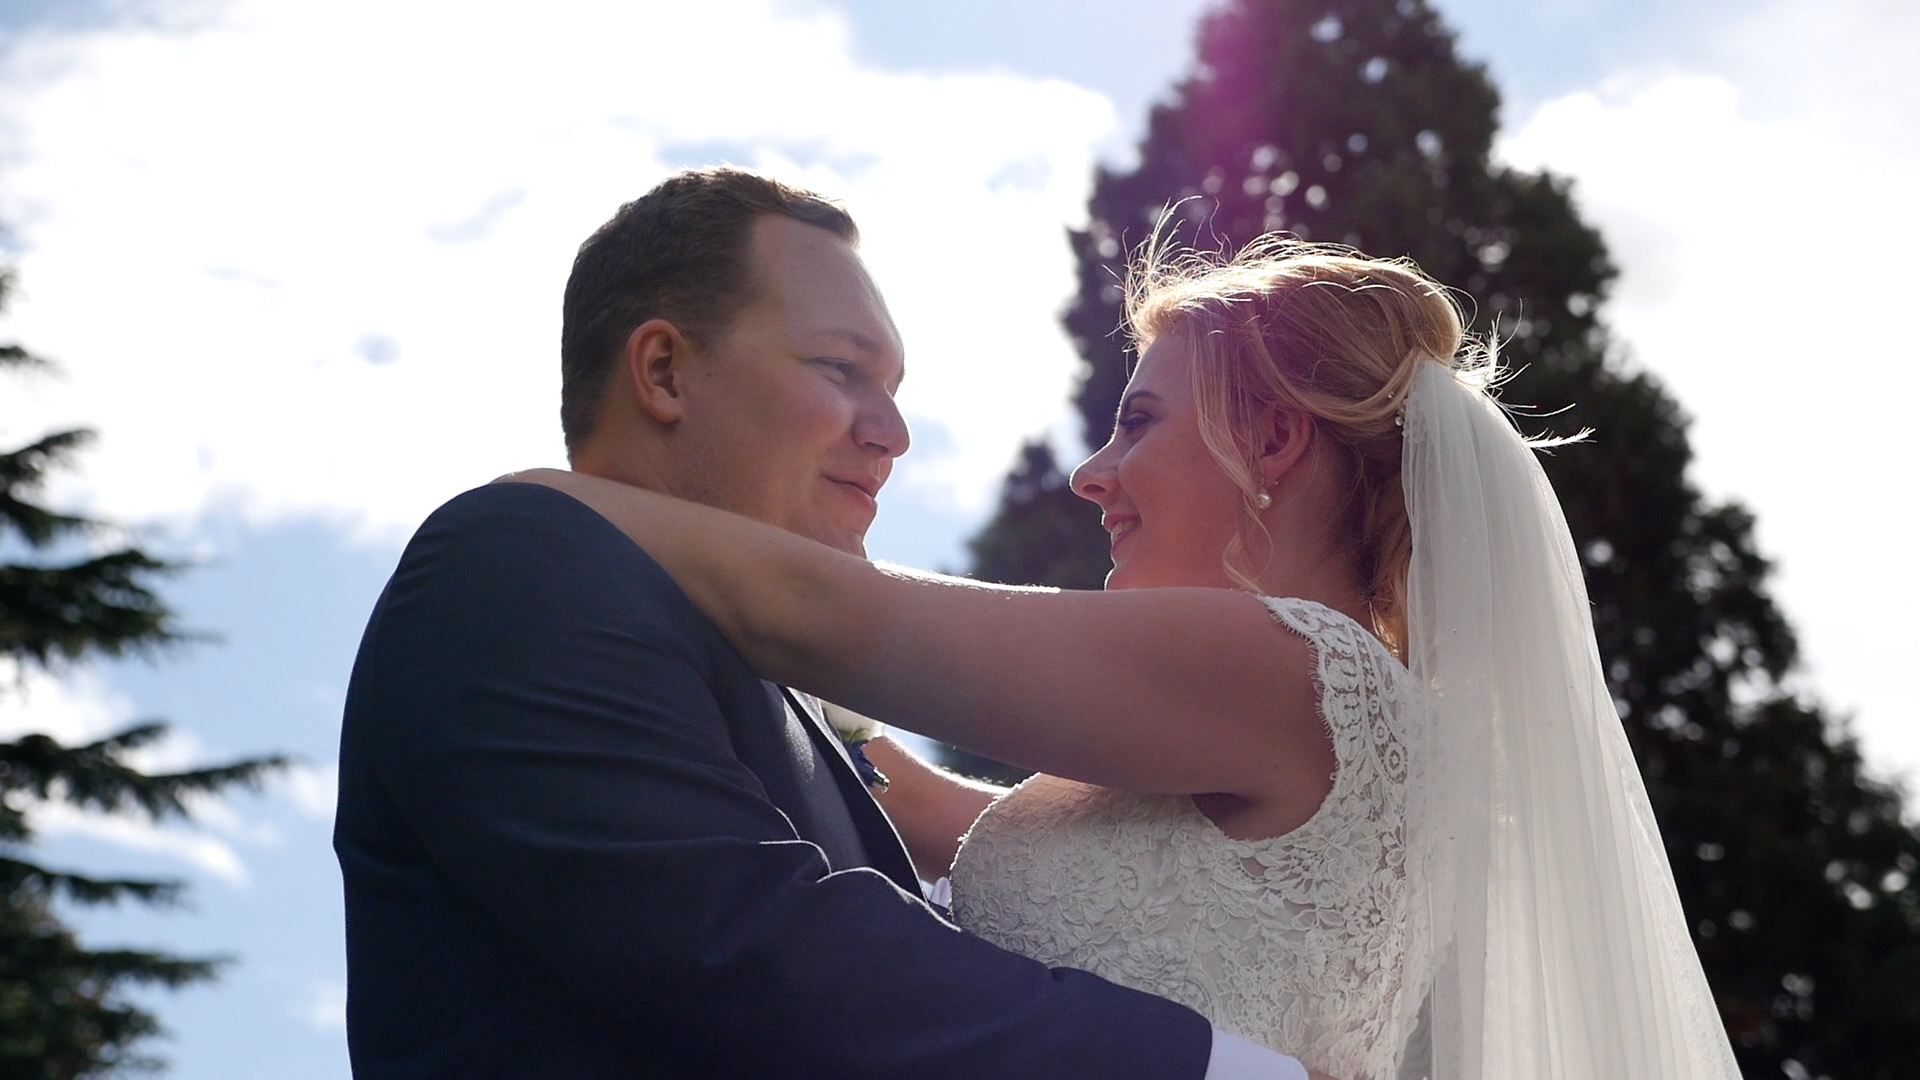 Wedding videographer Southend on sea, Wedding videographer Essex, wedding filming Suffolk, wedding videographer Kent, gosfield hall, apron hall, the lawn